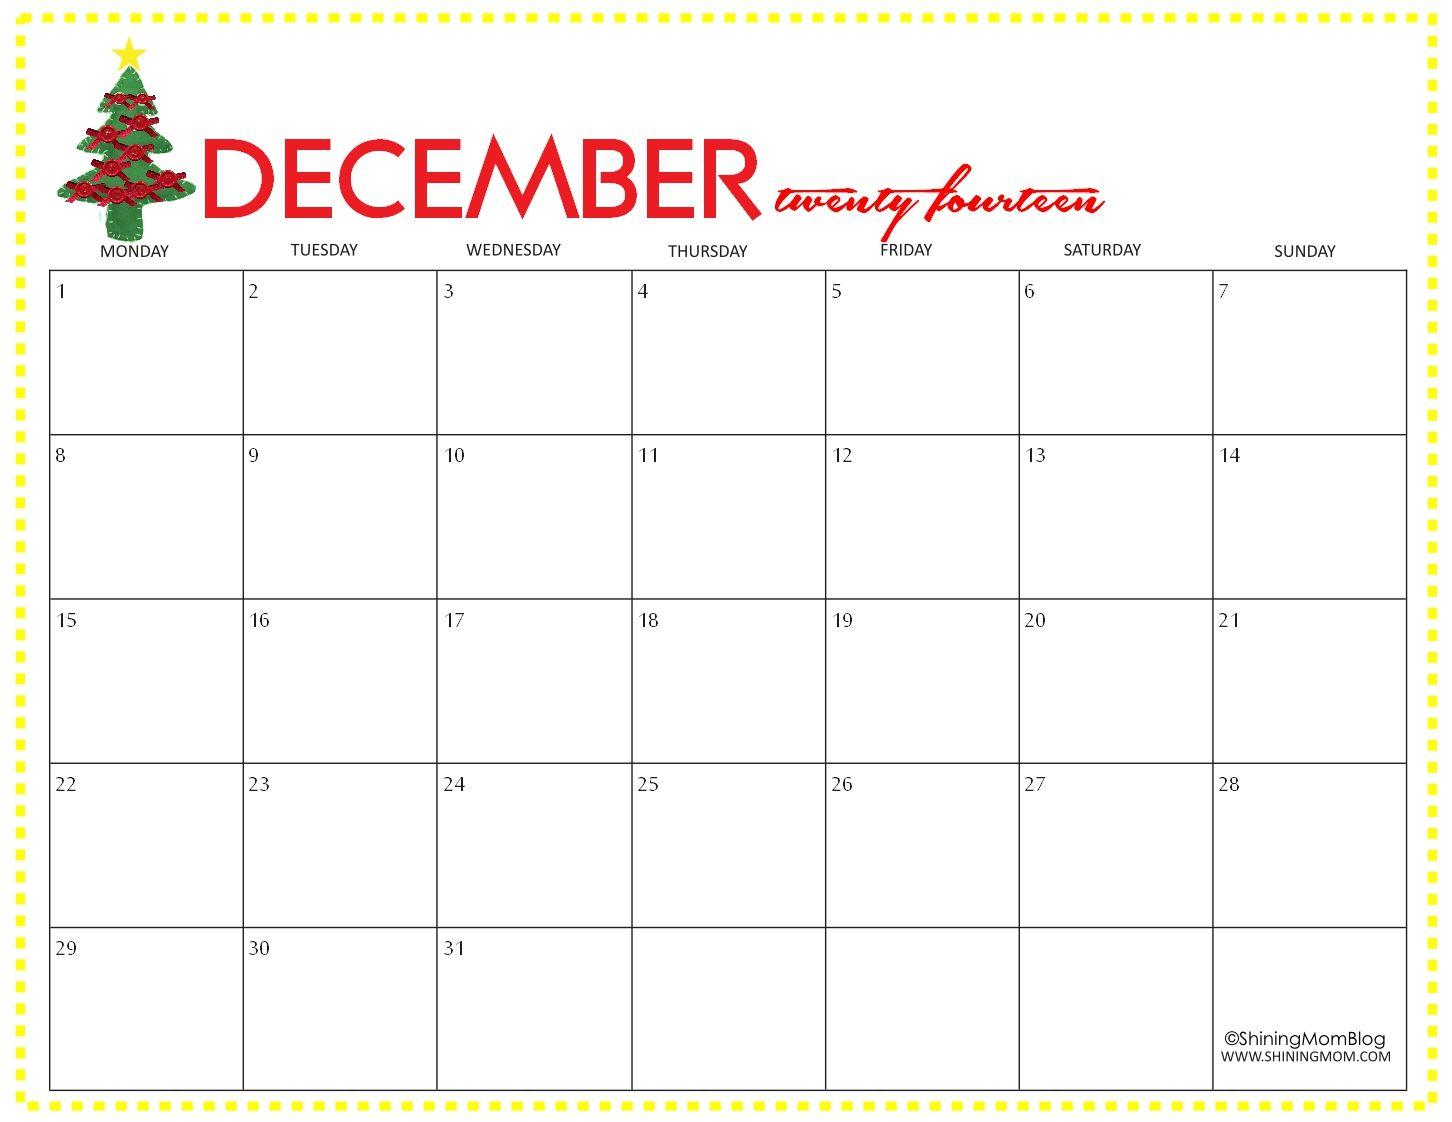 Blank Calendar December 2018 Printable | December 2018 Calendar pertaining to Christmas Calendar Printable Template